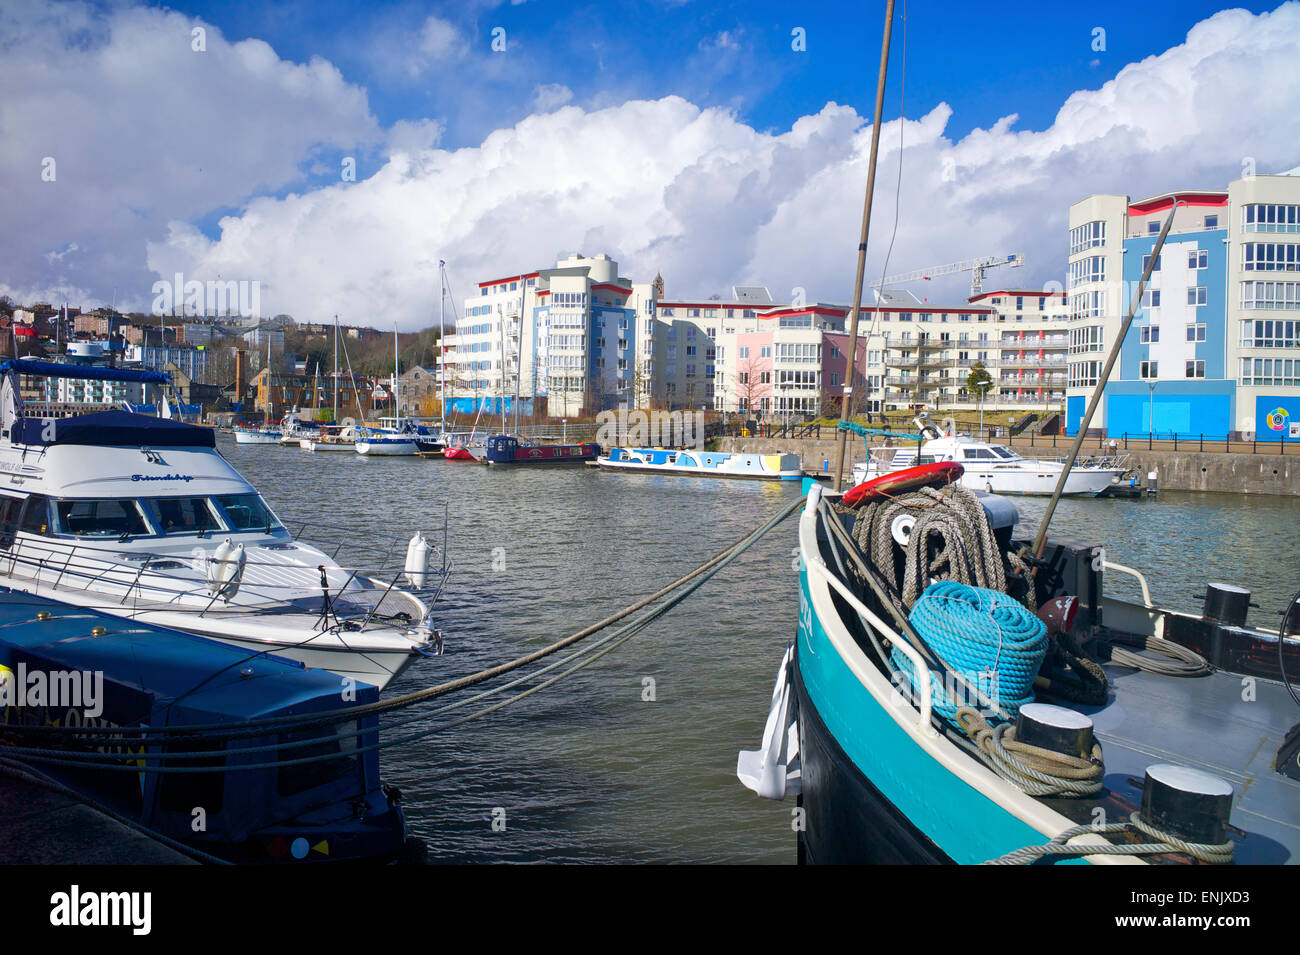 Bristol harbour, Bristol, England, United Kingdom, Europe - Stock Image